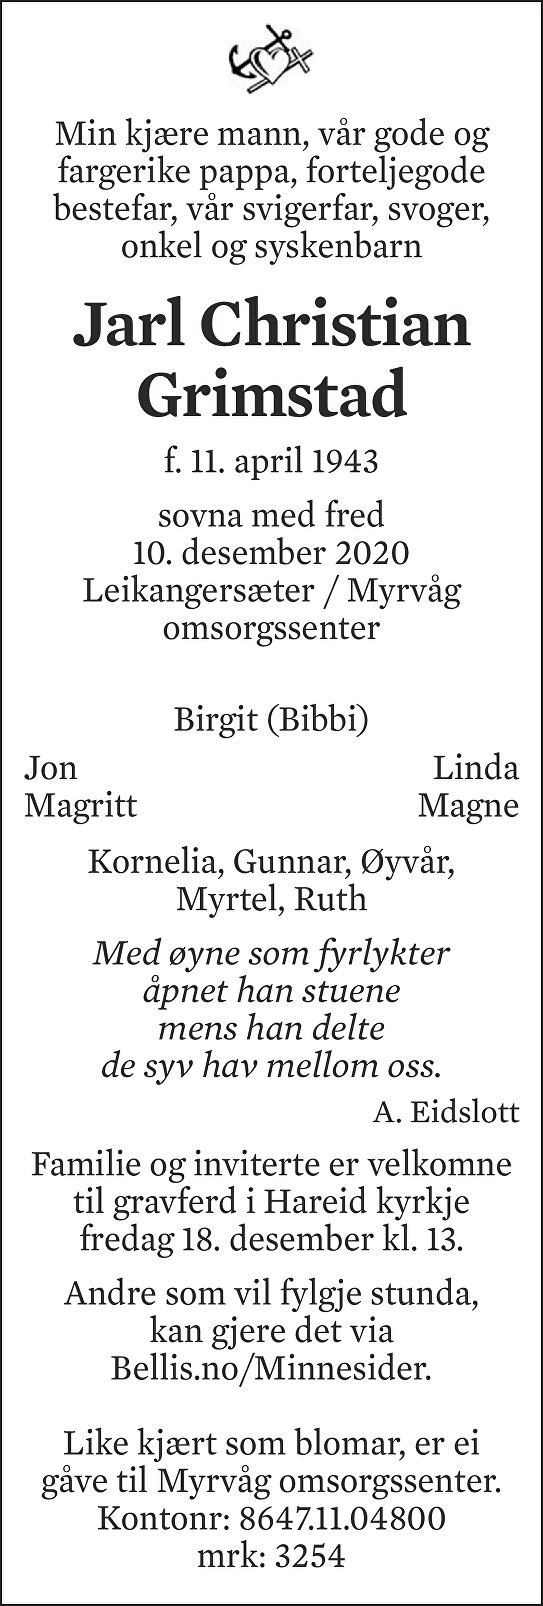 Jarl Christian Grimstad Dødsannonse